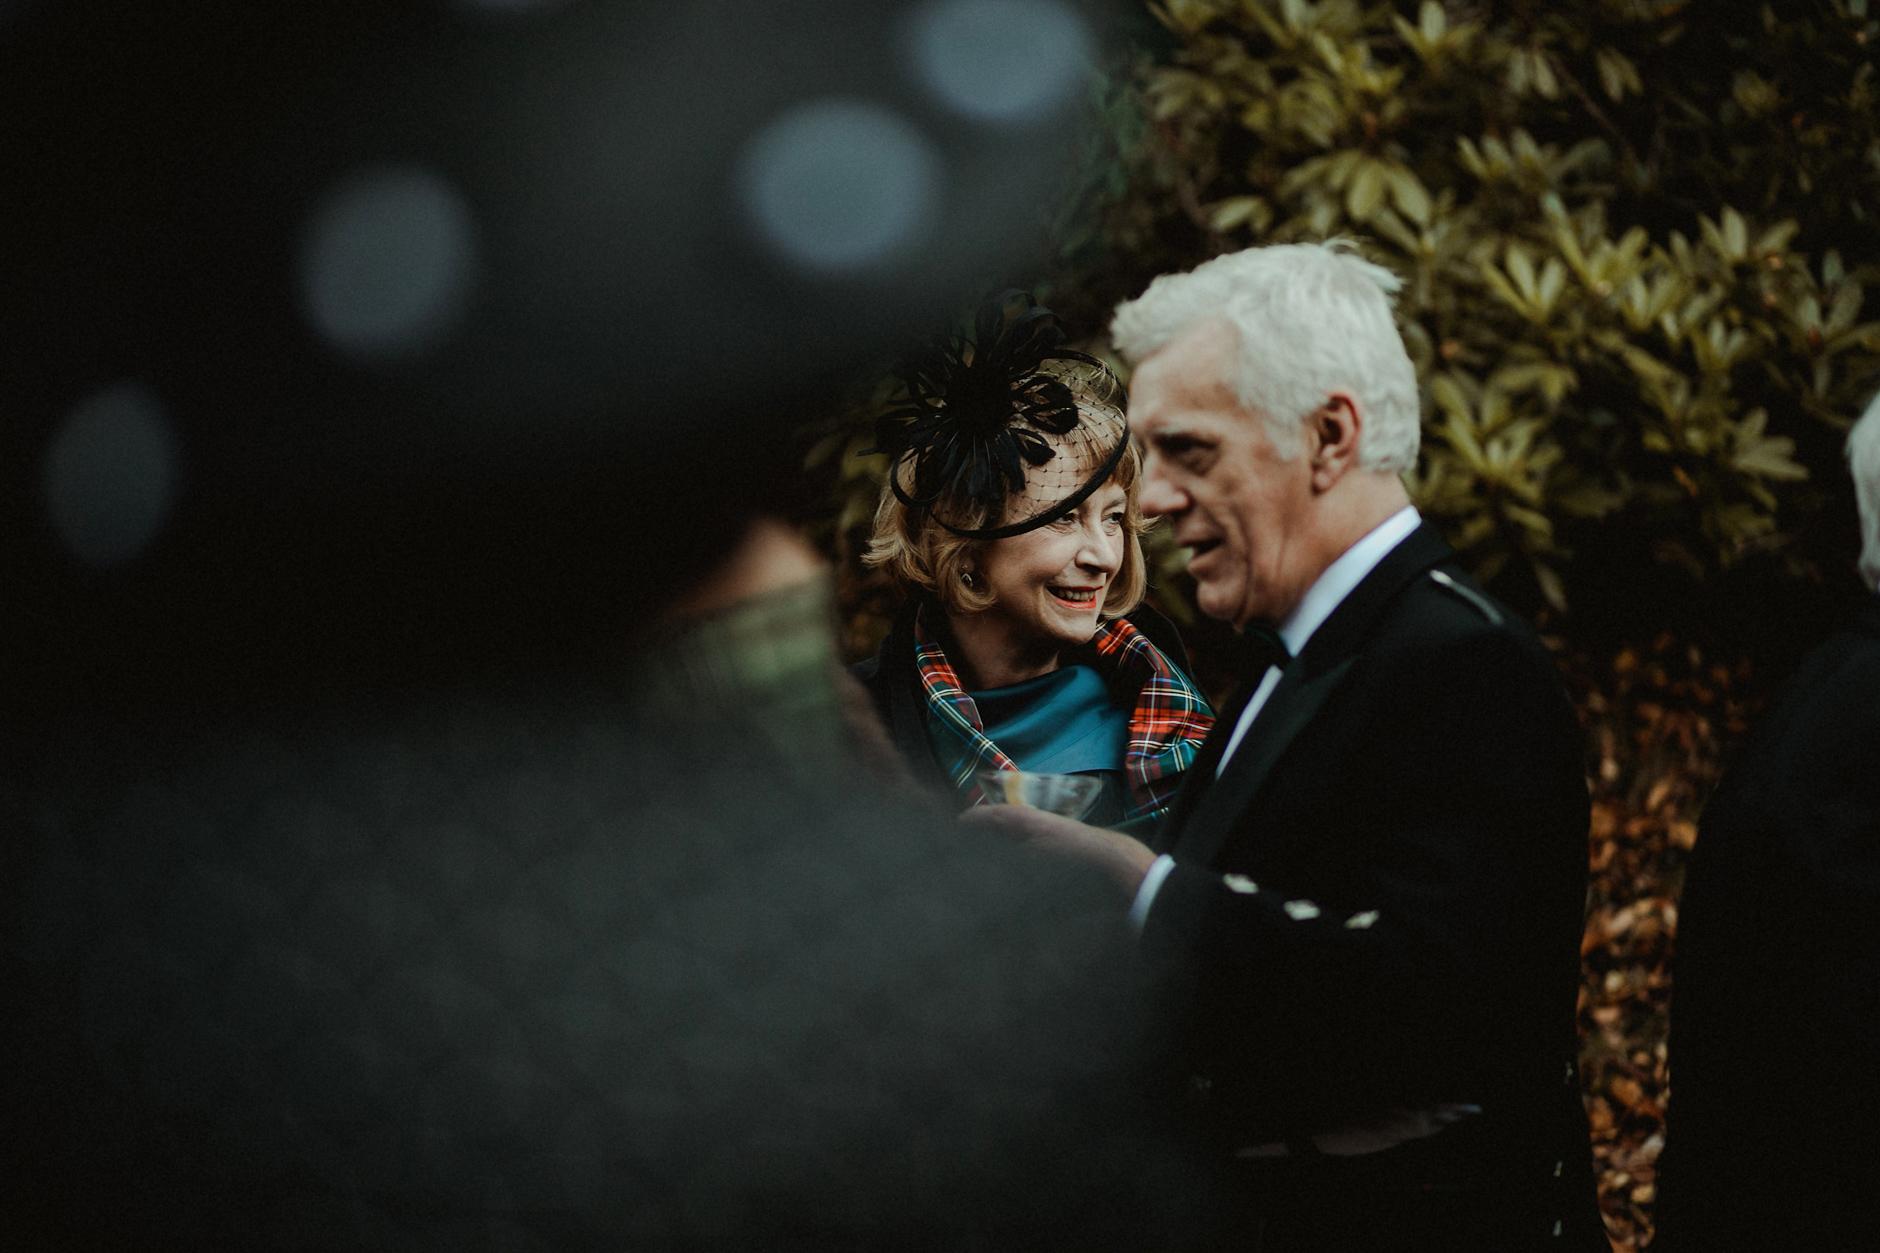 Glentruim-Wedding-Nikki-Leadbetter-Photography-54.jpg